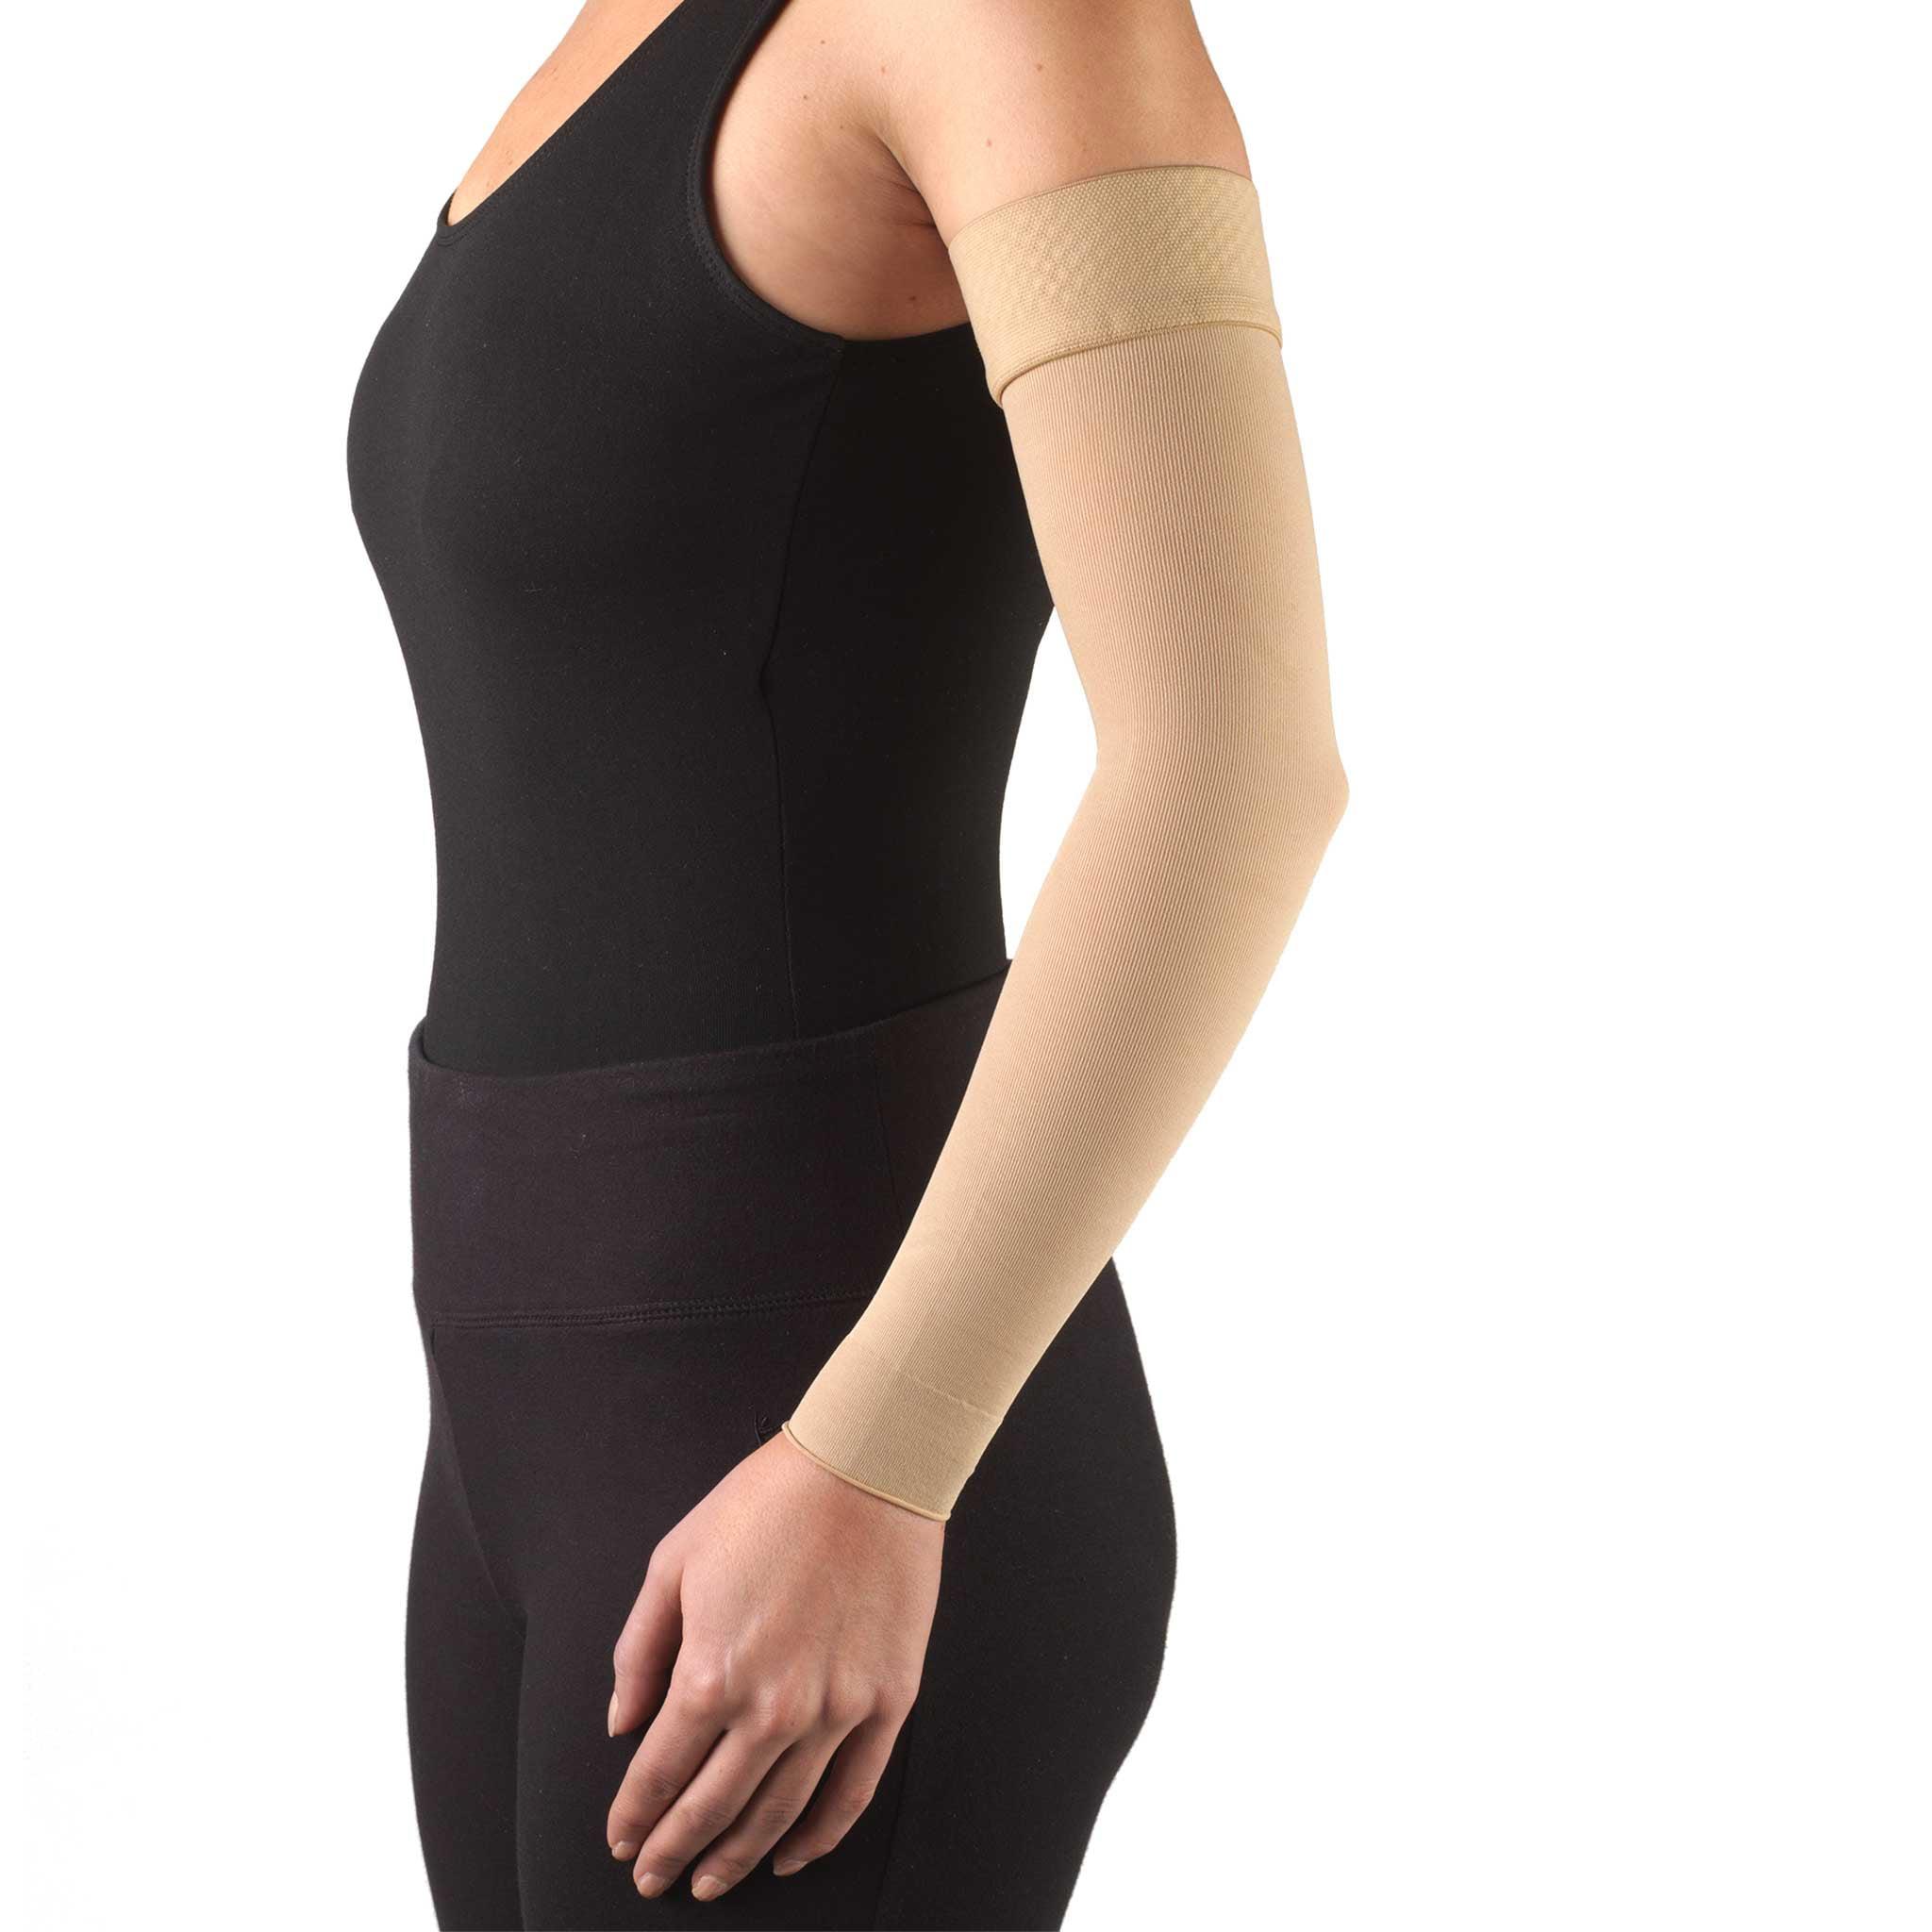 Truform Lymphedema Compression Arm Sleeve, Dot Top: 15-20 mmHg, Beige, Medium